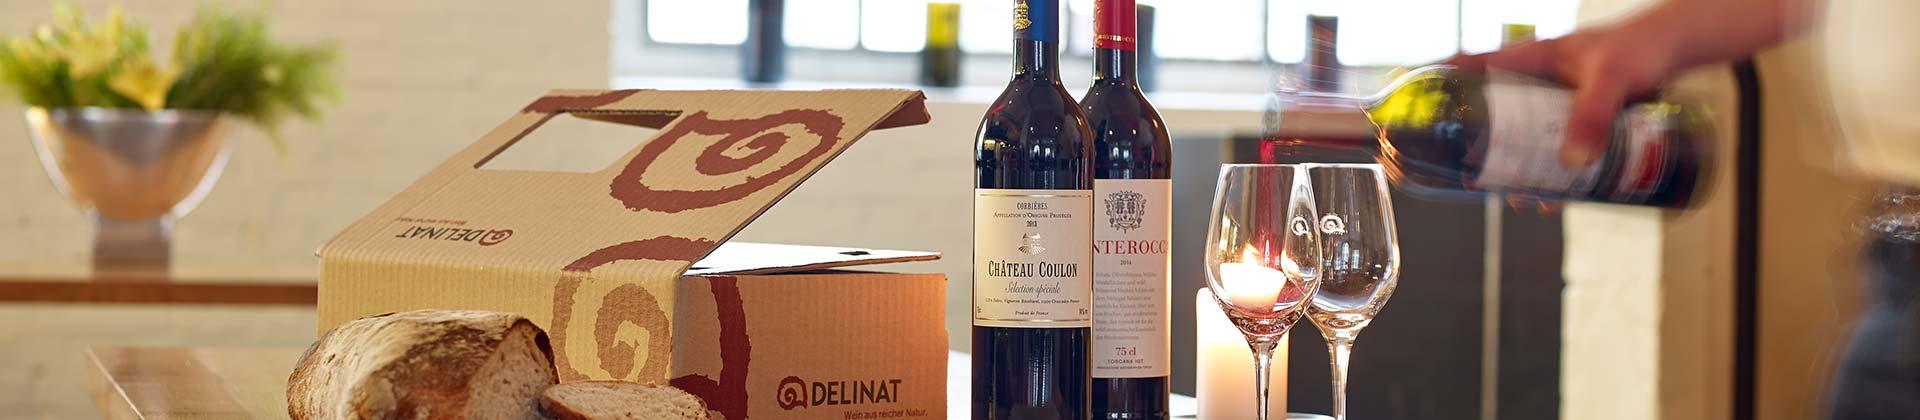 Delinat-Weinabo verschenken